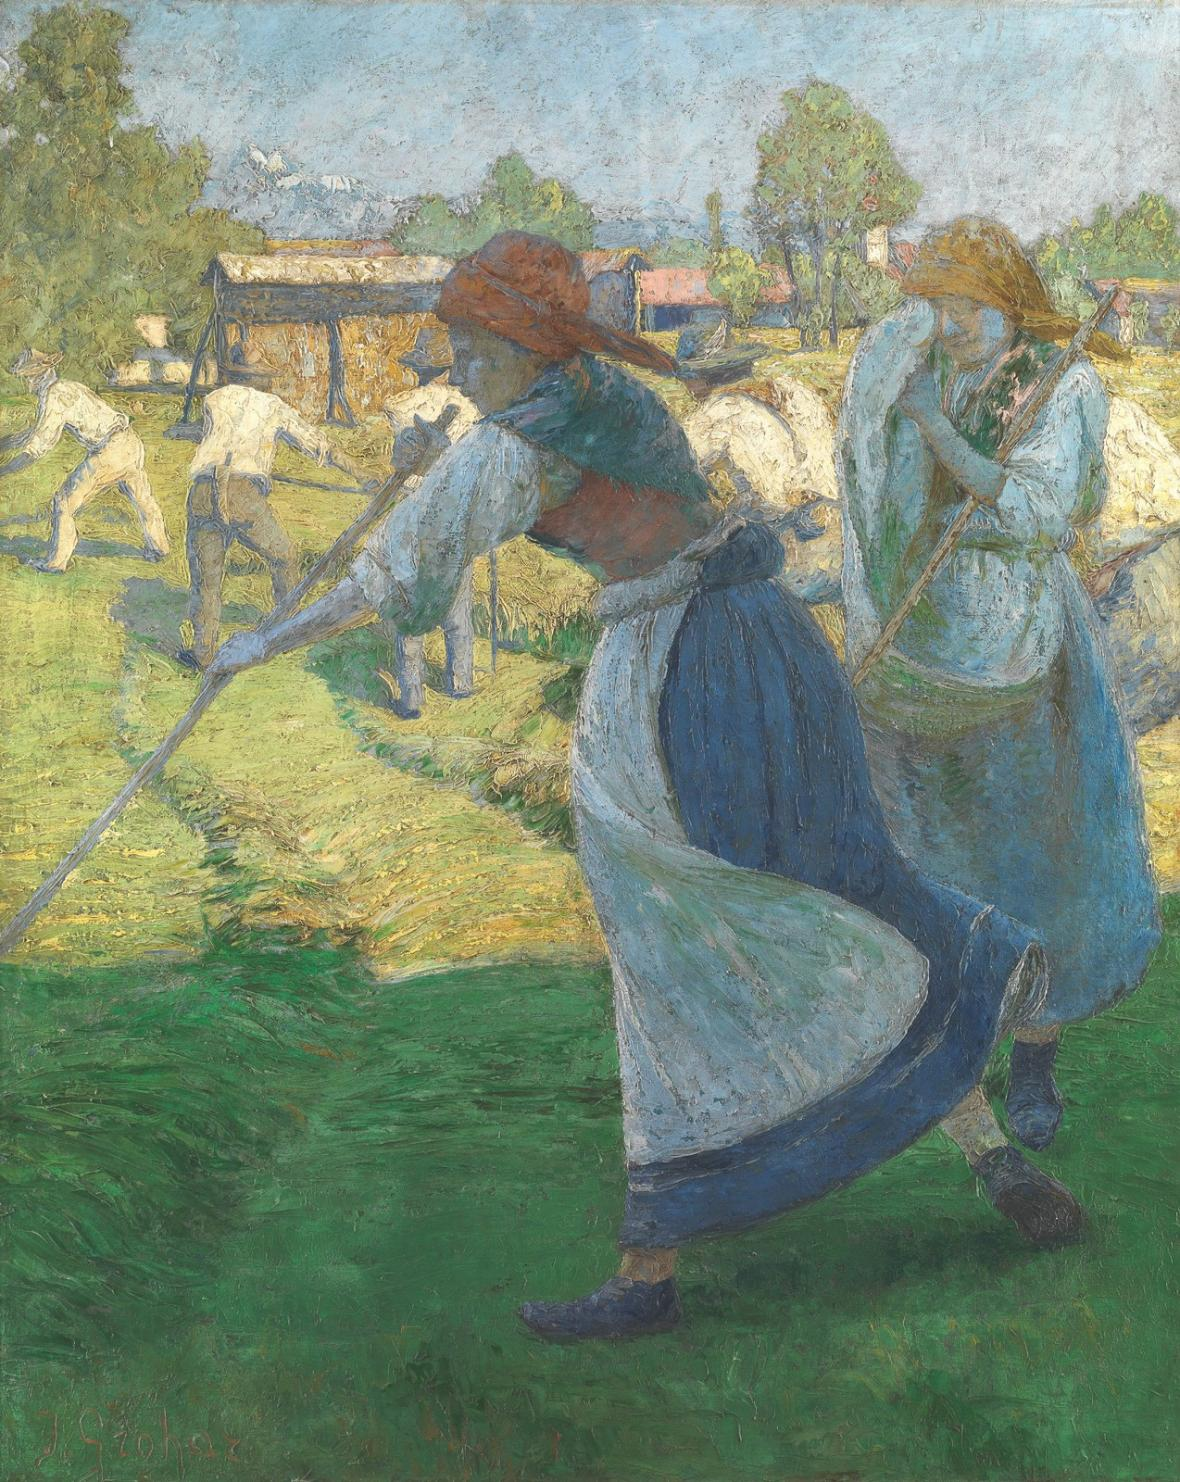 Ivan Grohar / Hrabání (Senoseč), 1902